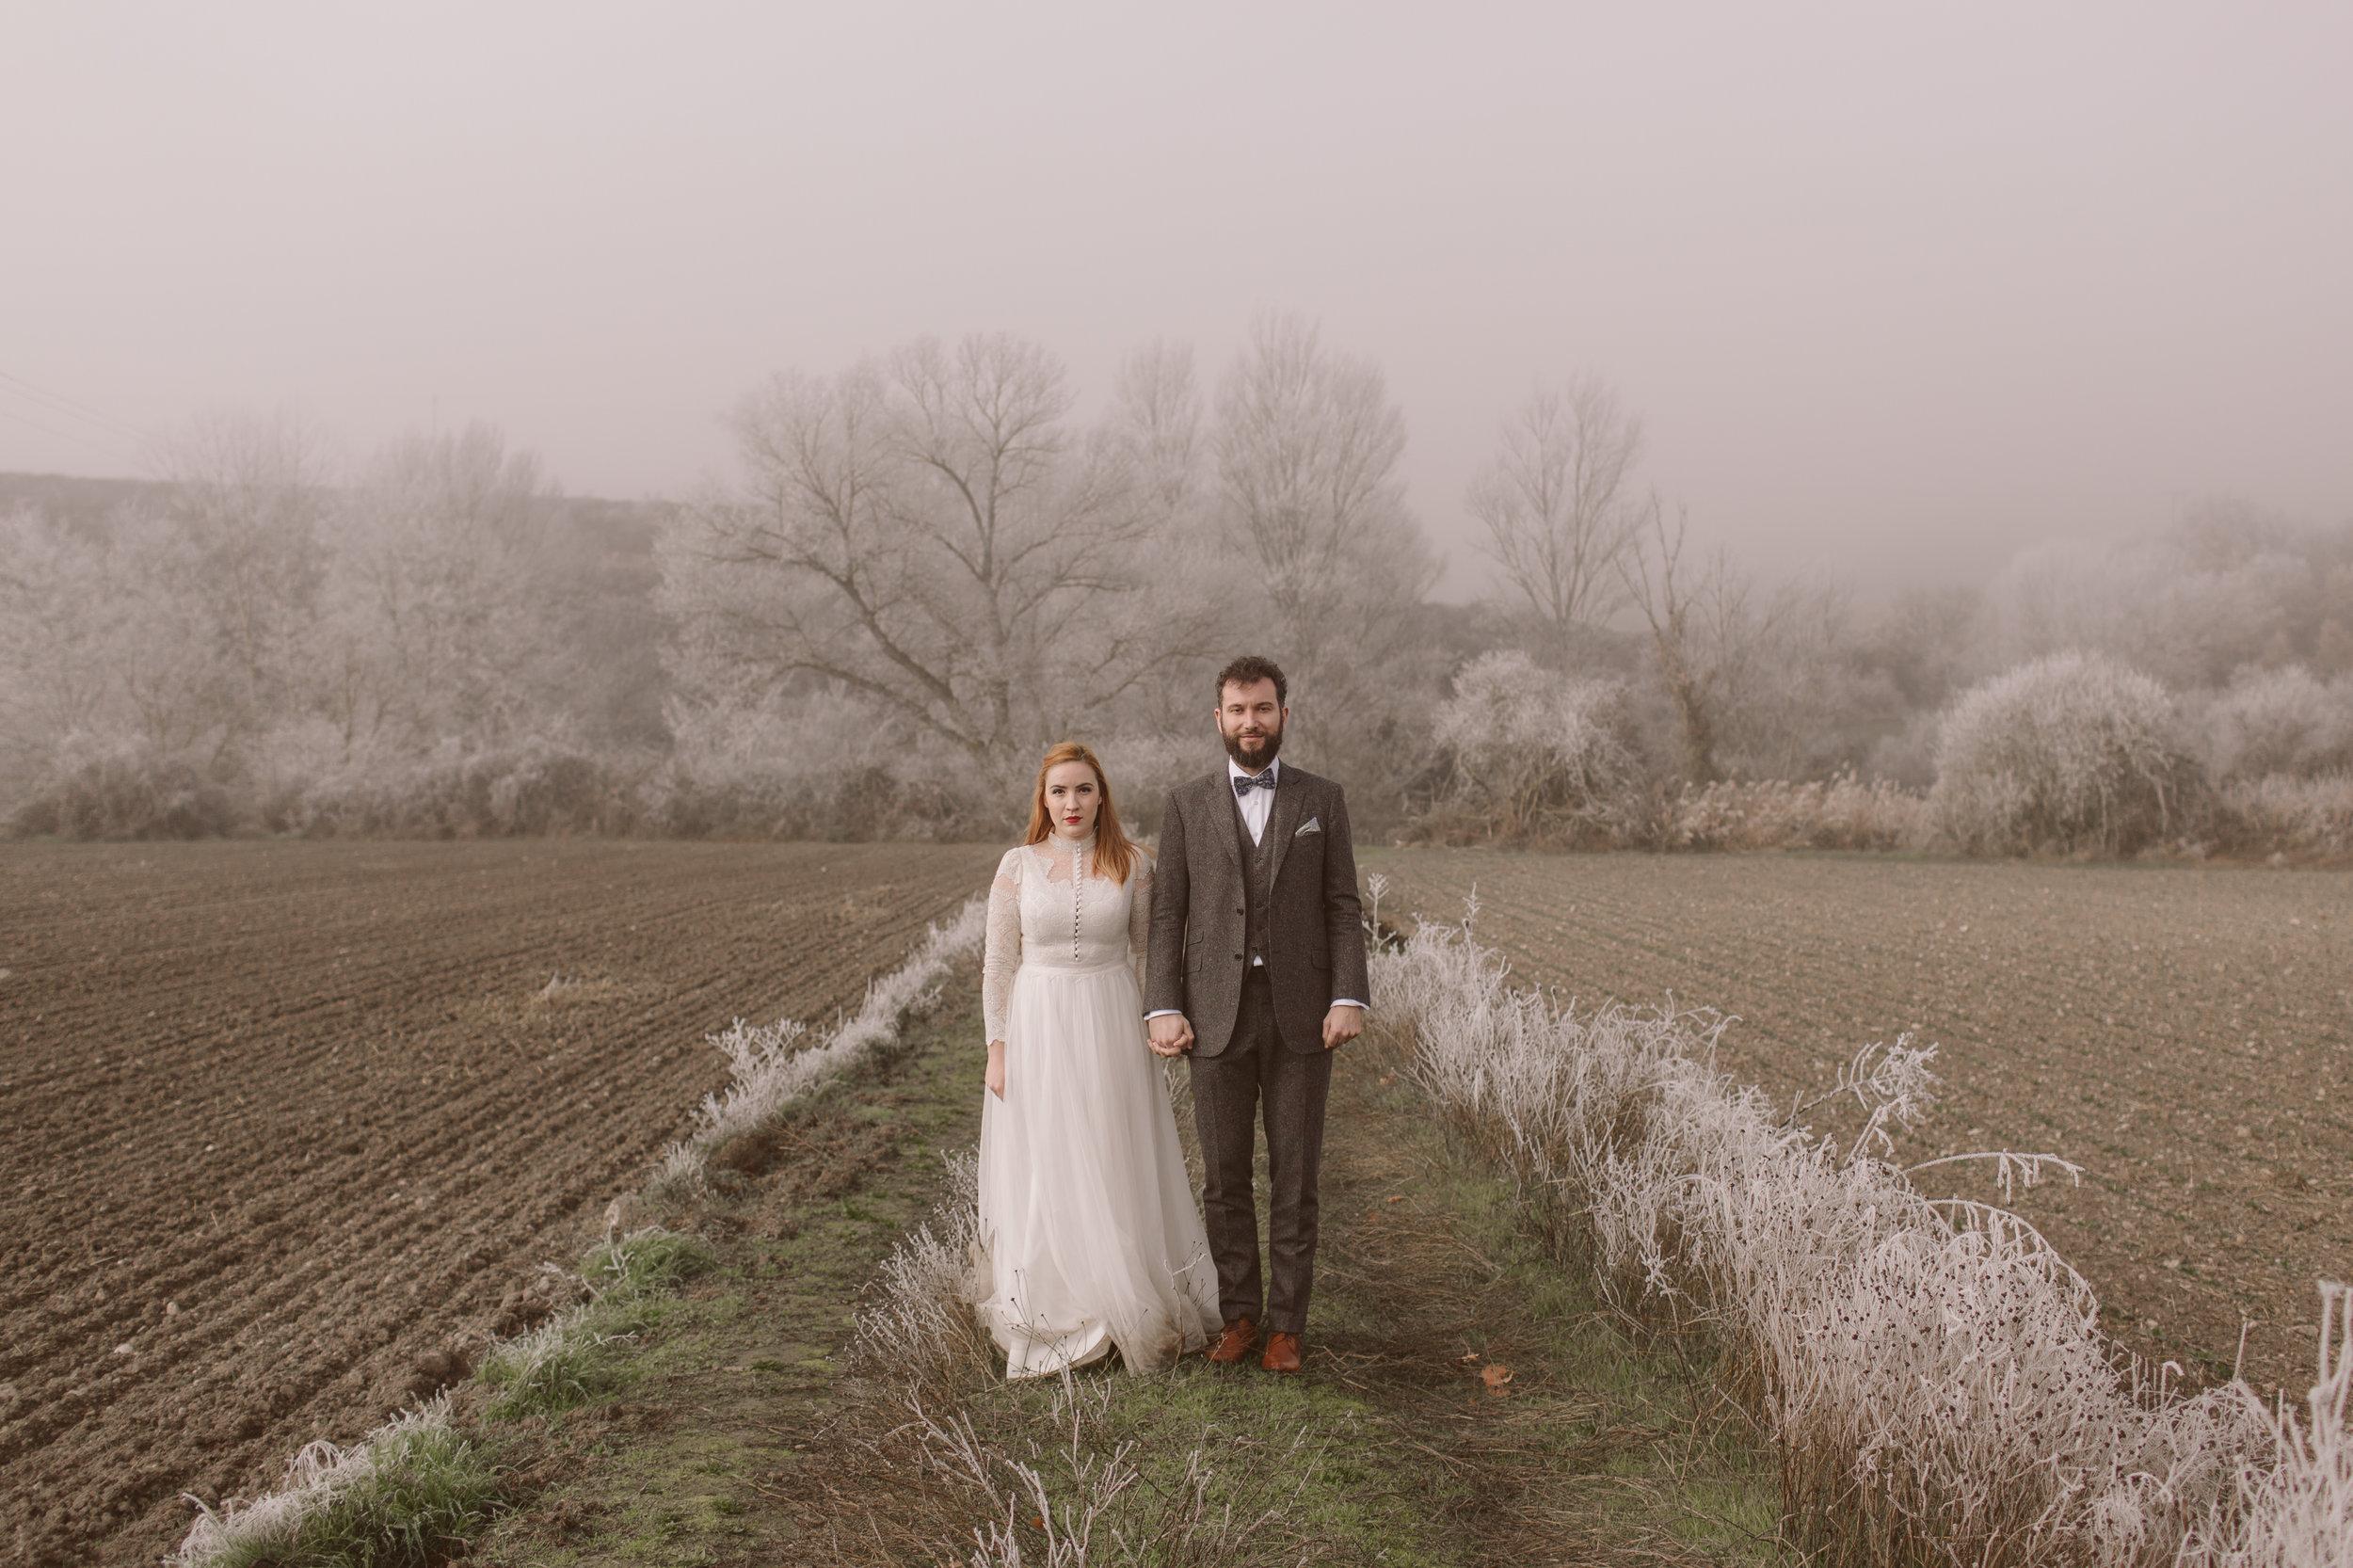 PEOPLE TRUE LOVE  Wedding photographer  EDITING LEVEL: BASIC+ PRESET: VSCO based WE EDIT: Full galleries. Portfolio handled in-house.